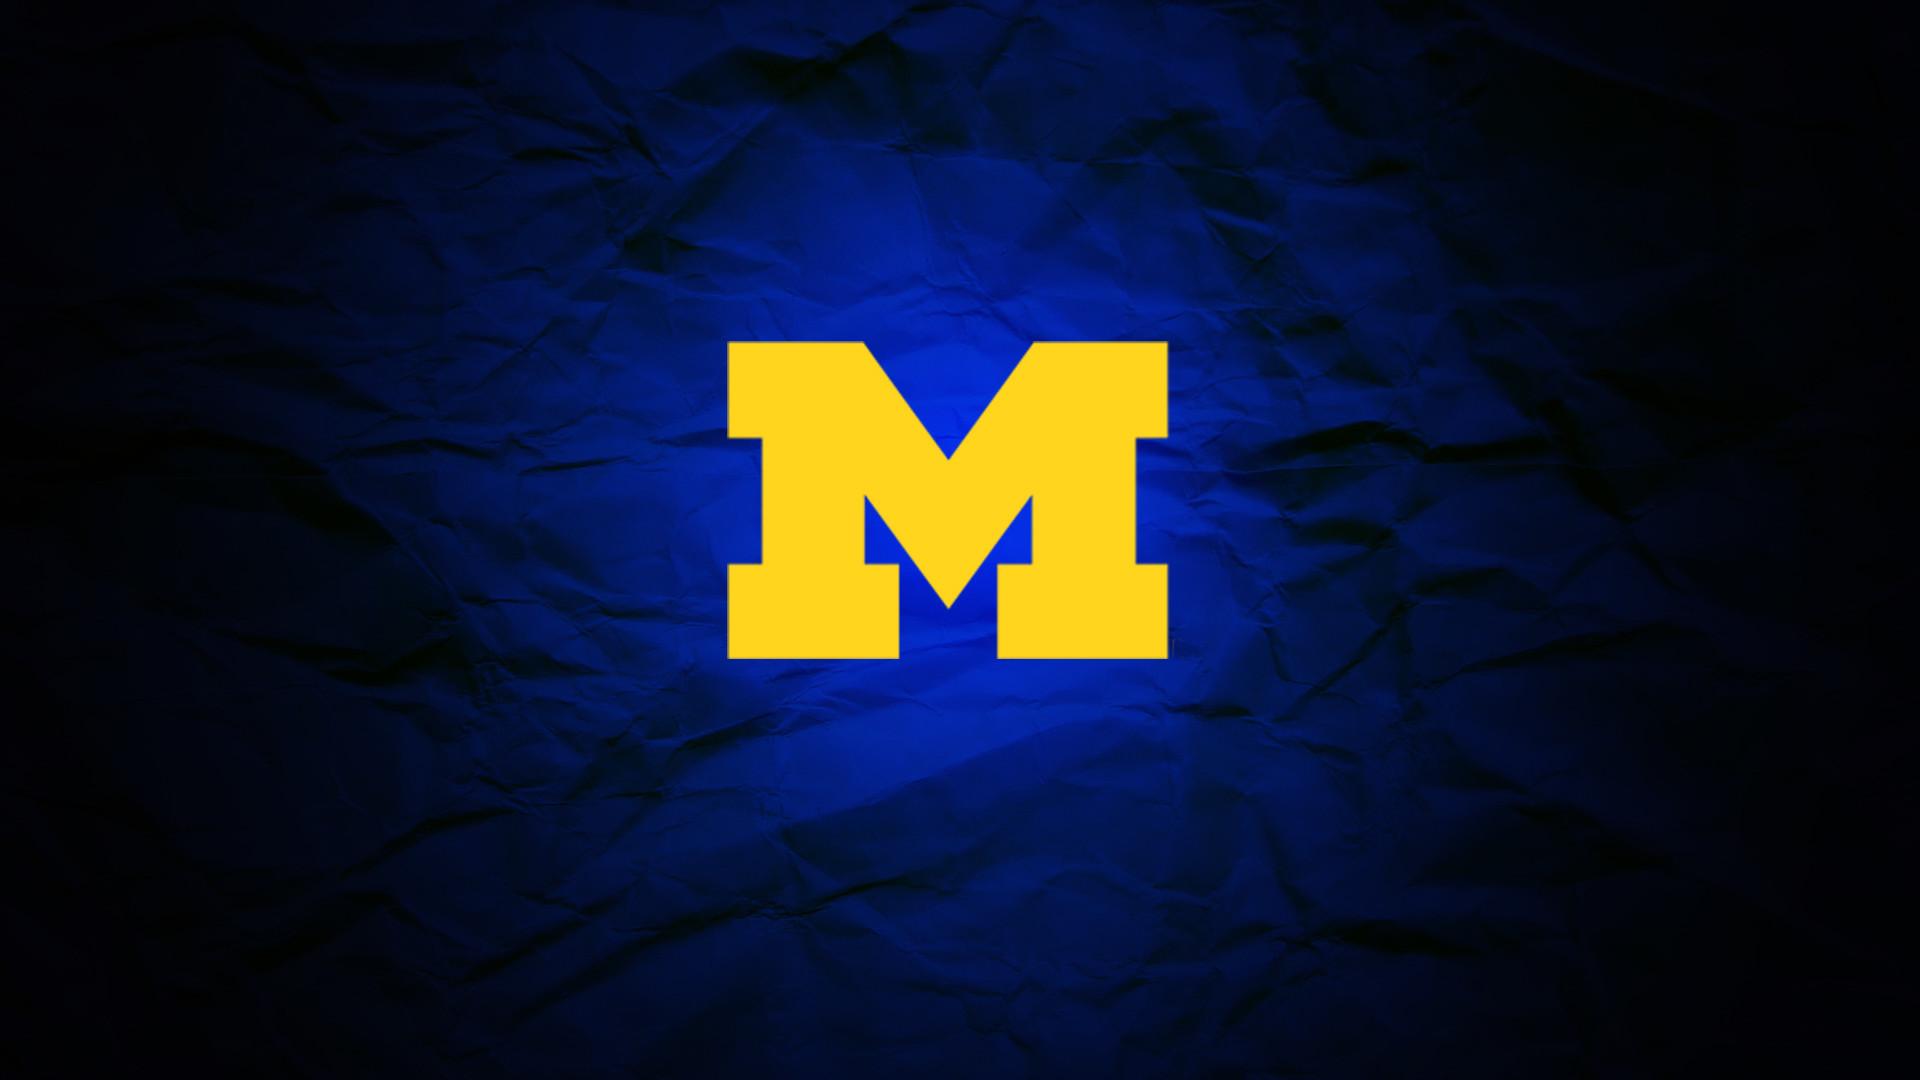 Michigan University Wallpaper Michigan, University, Of